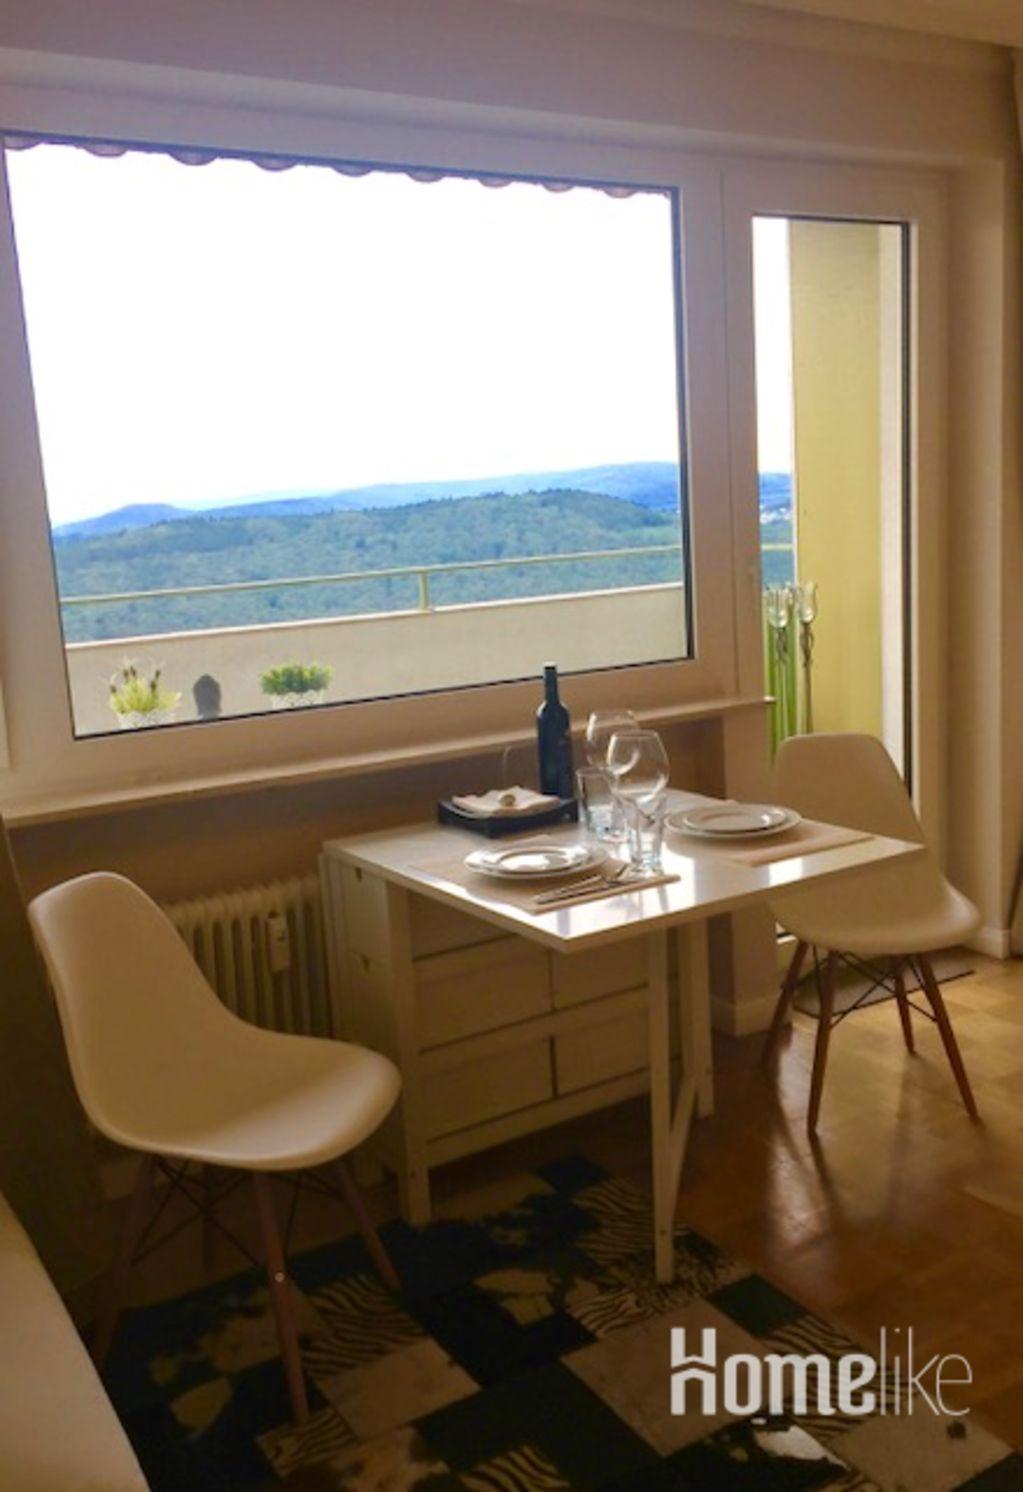 image 6 furnished 1 bedroom Apartment for rent in Kelkheim, Main-Taunus-Kreis